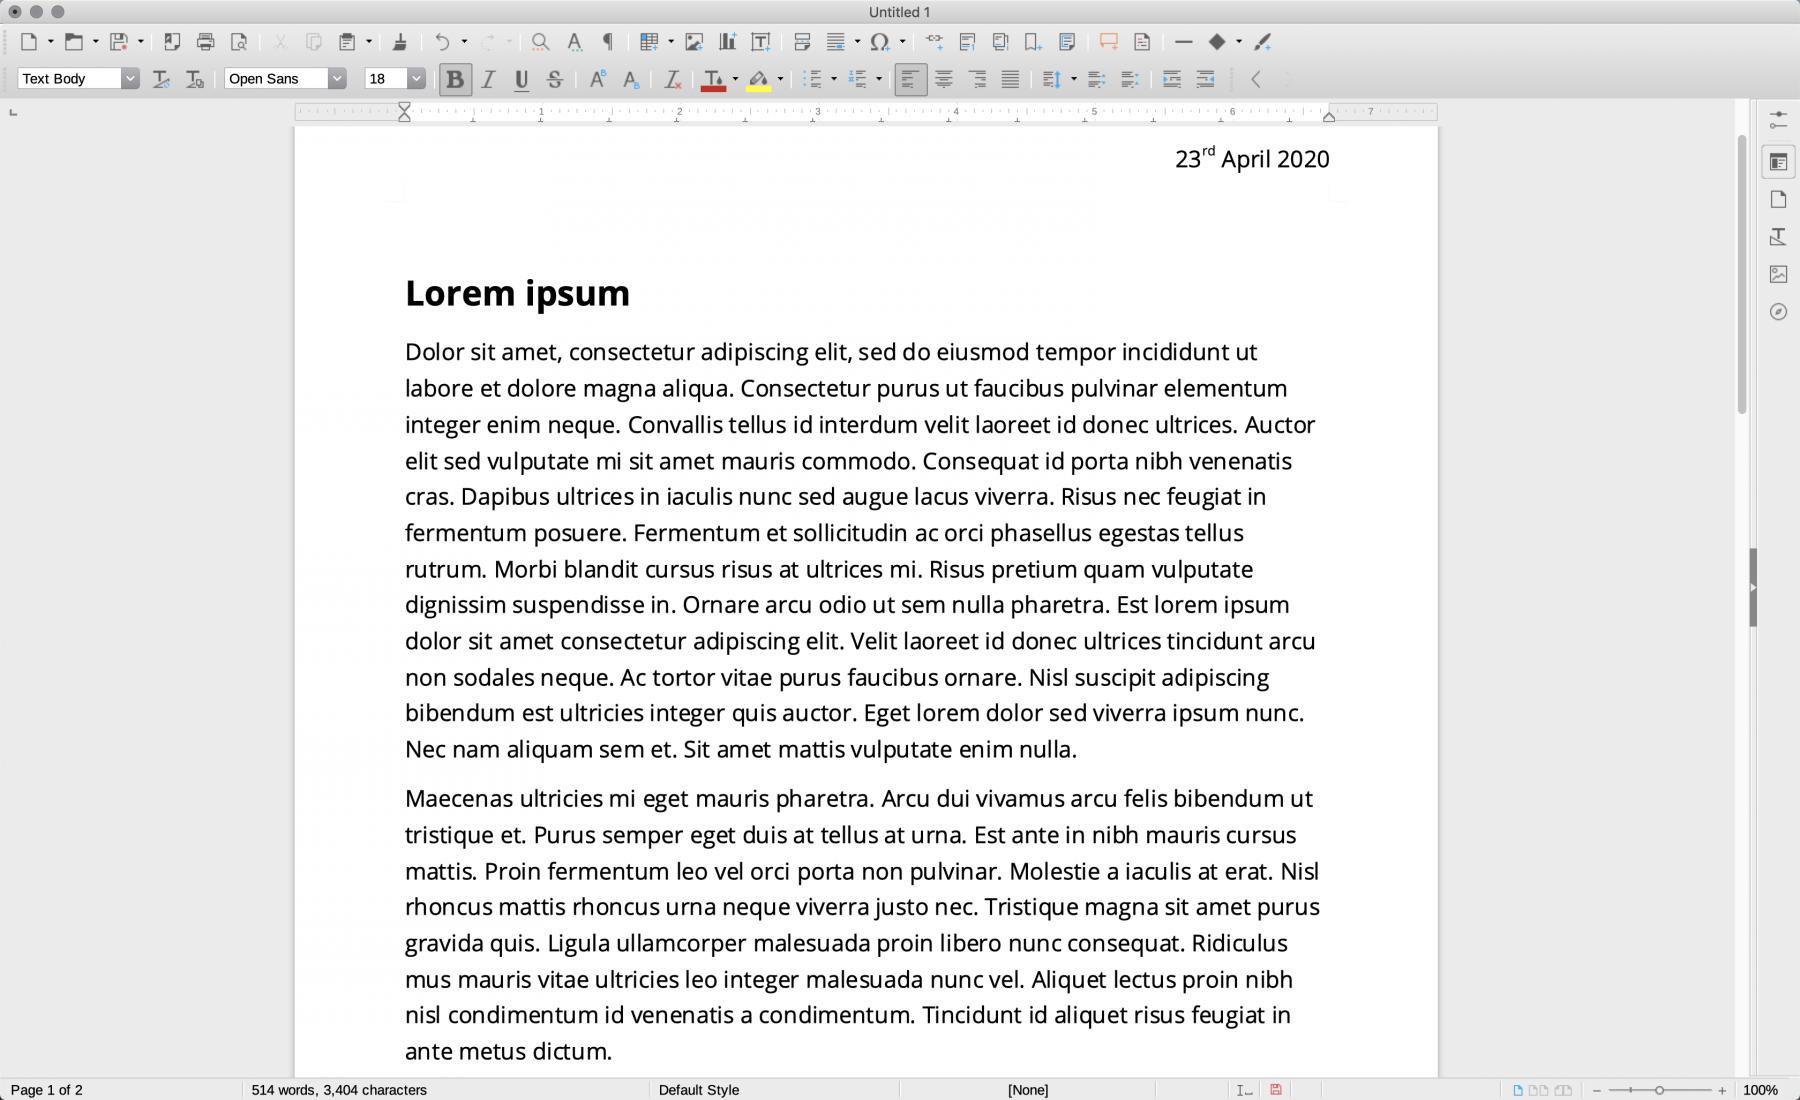 Screenshot of LibreOffice's word processing tool